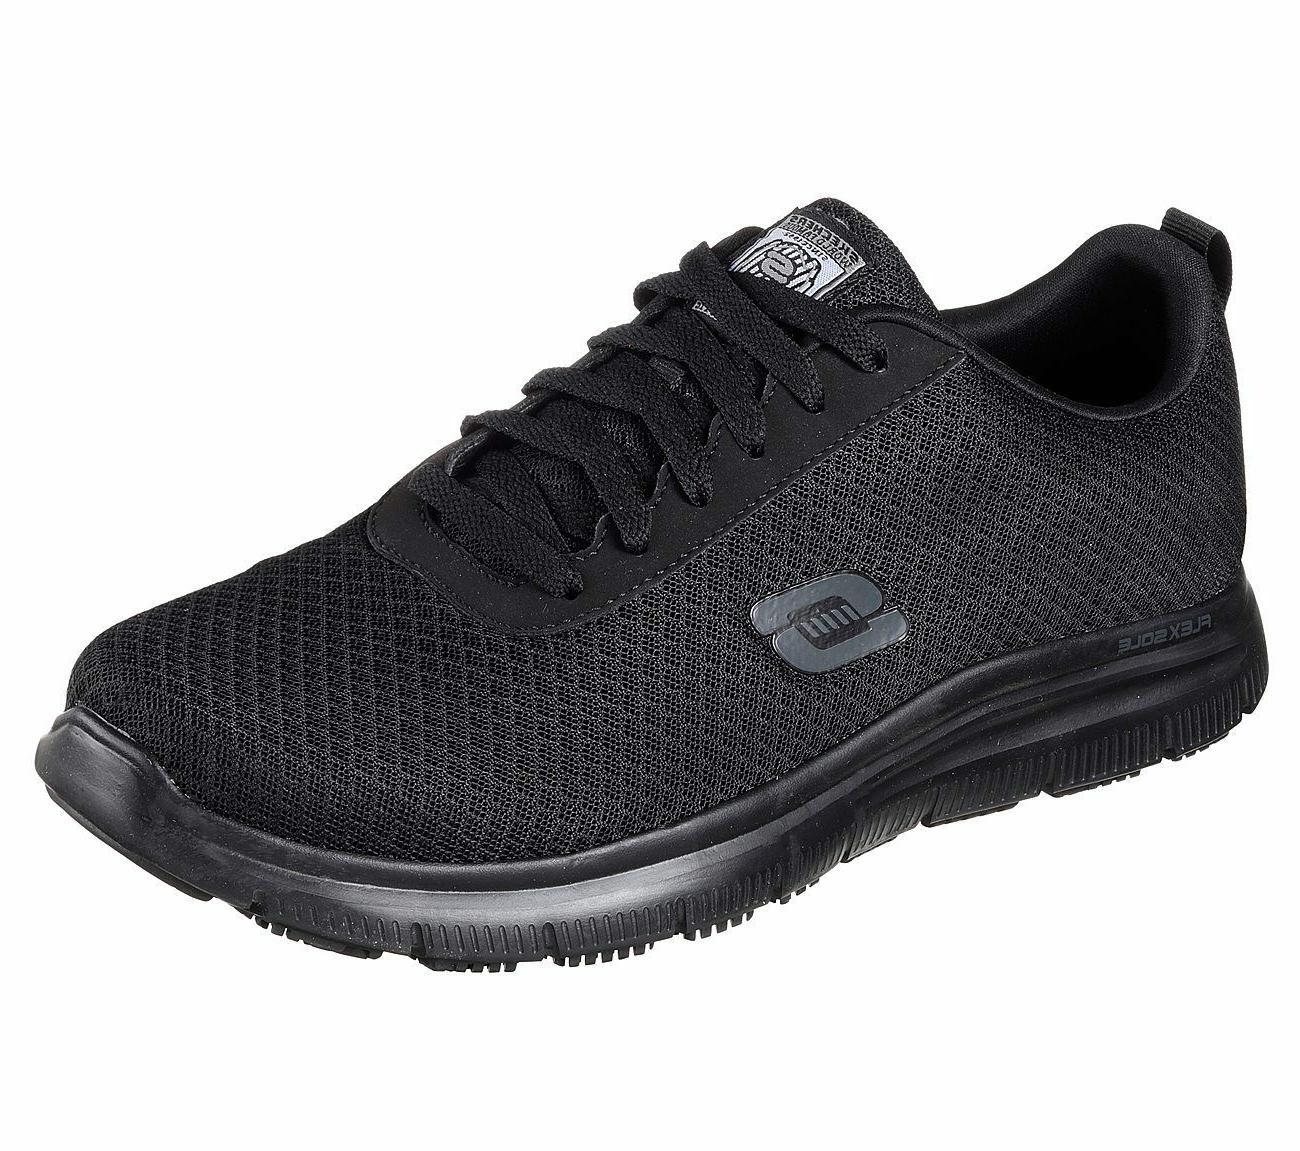 Skechers Black shoes Work Men Comfort Mesh Slip Resistant Me